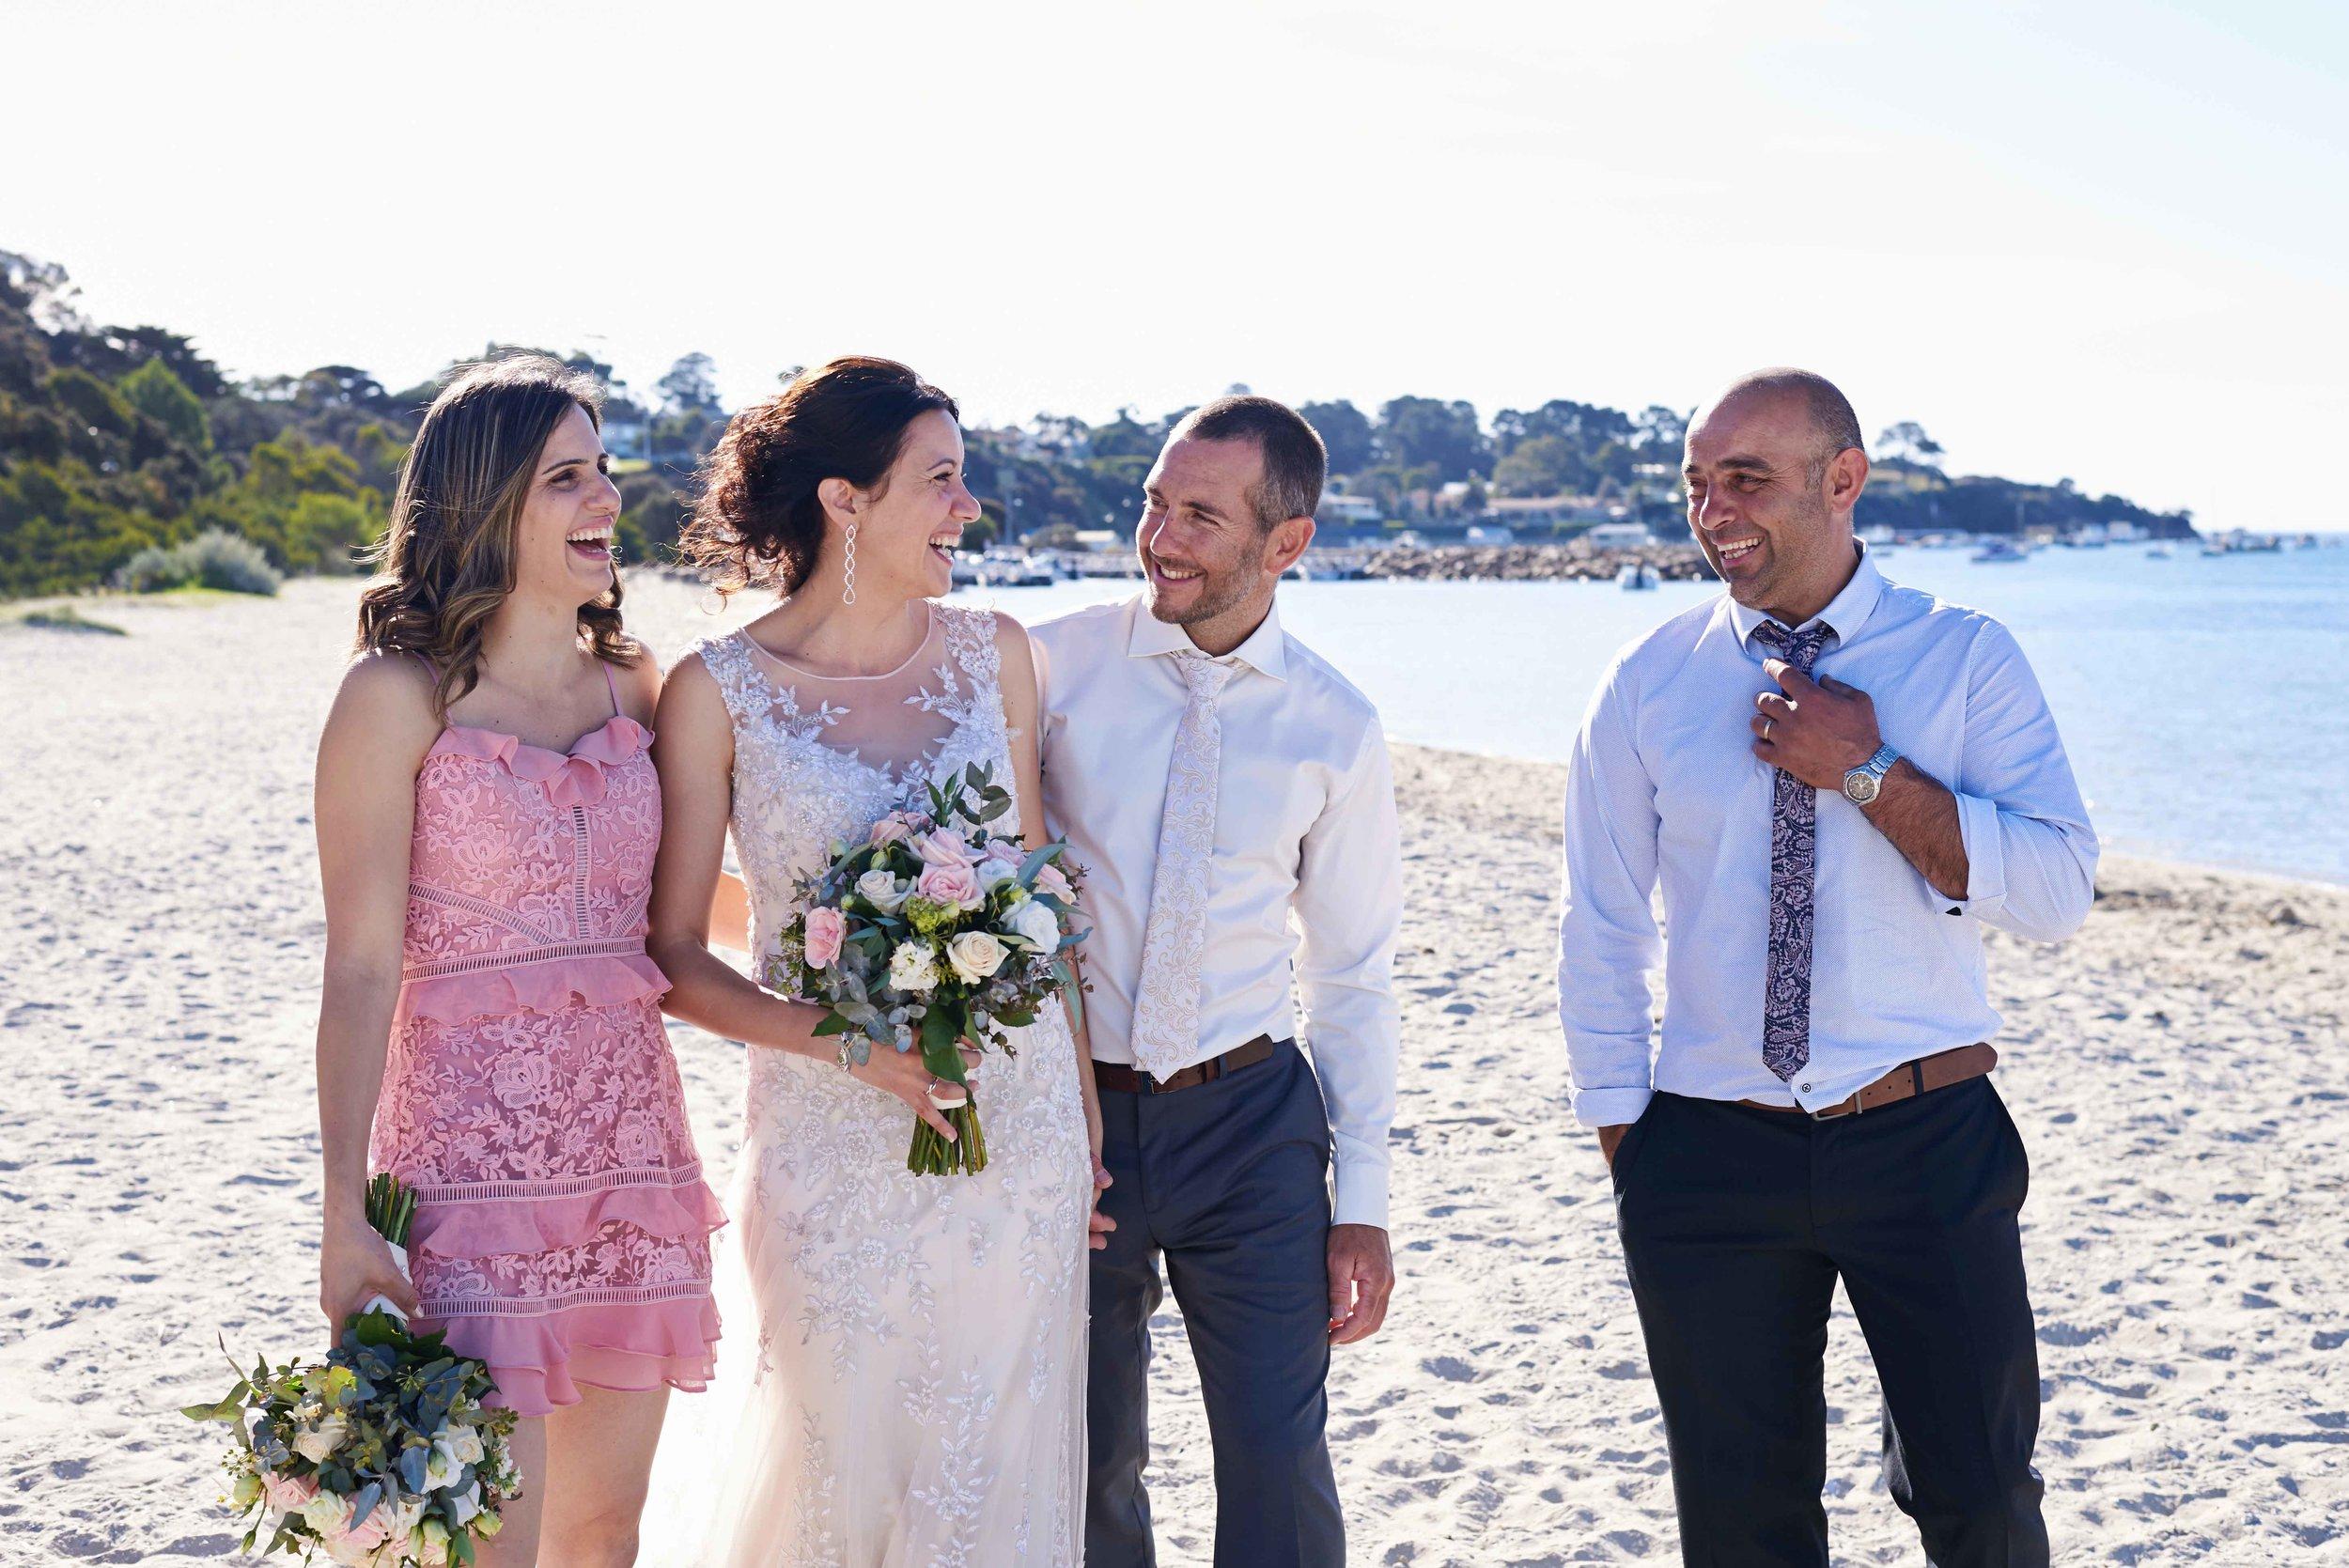 sorrento-wedding-photography-all-smiles-marissa-jade-photography-165.jpg